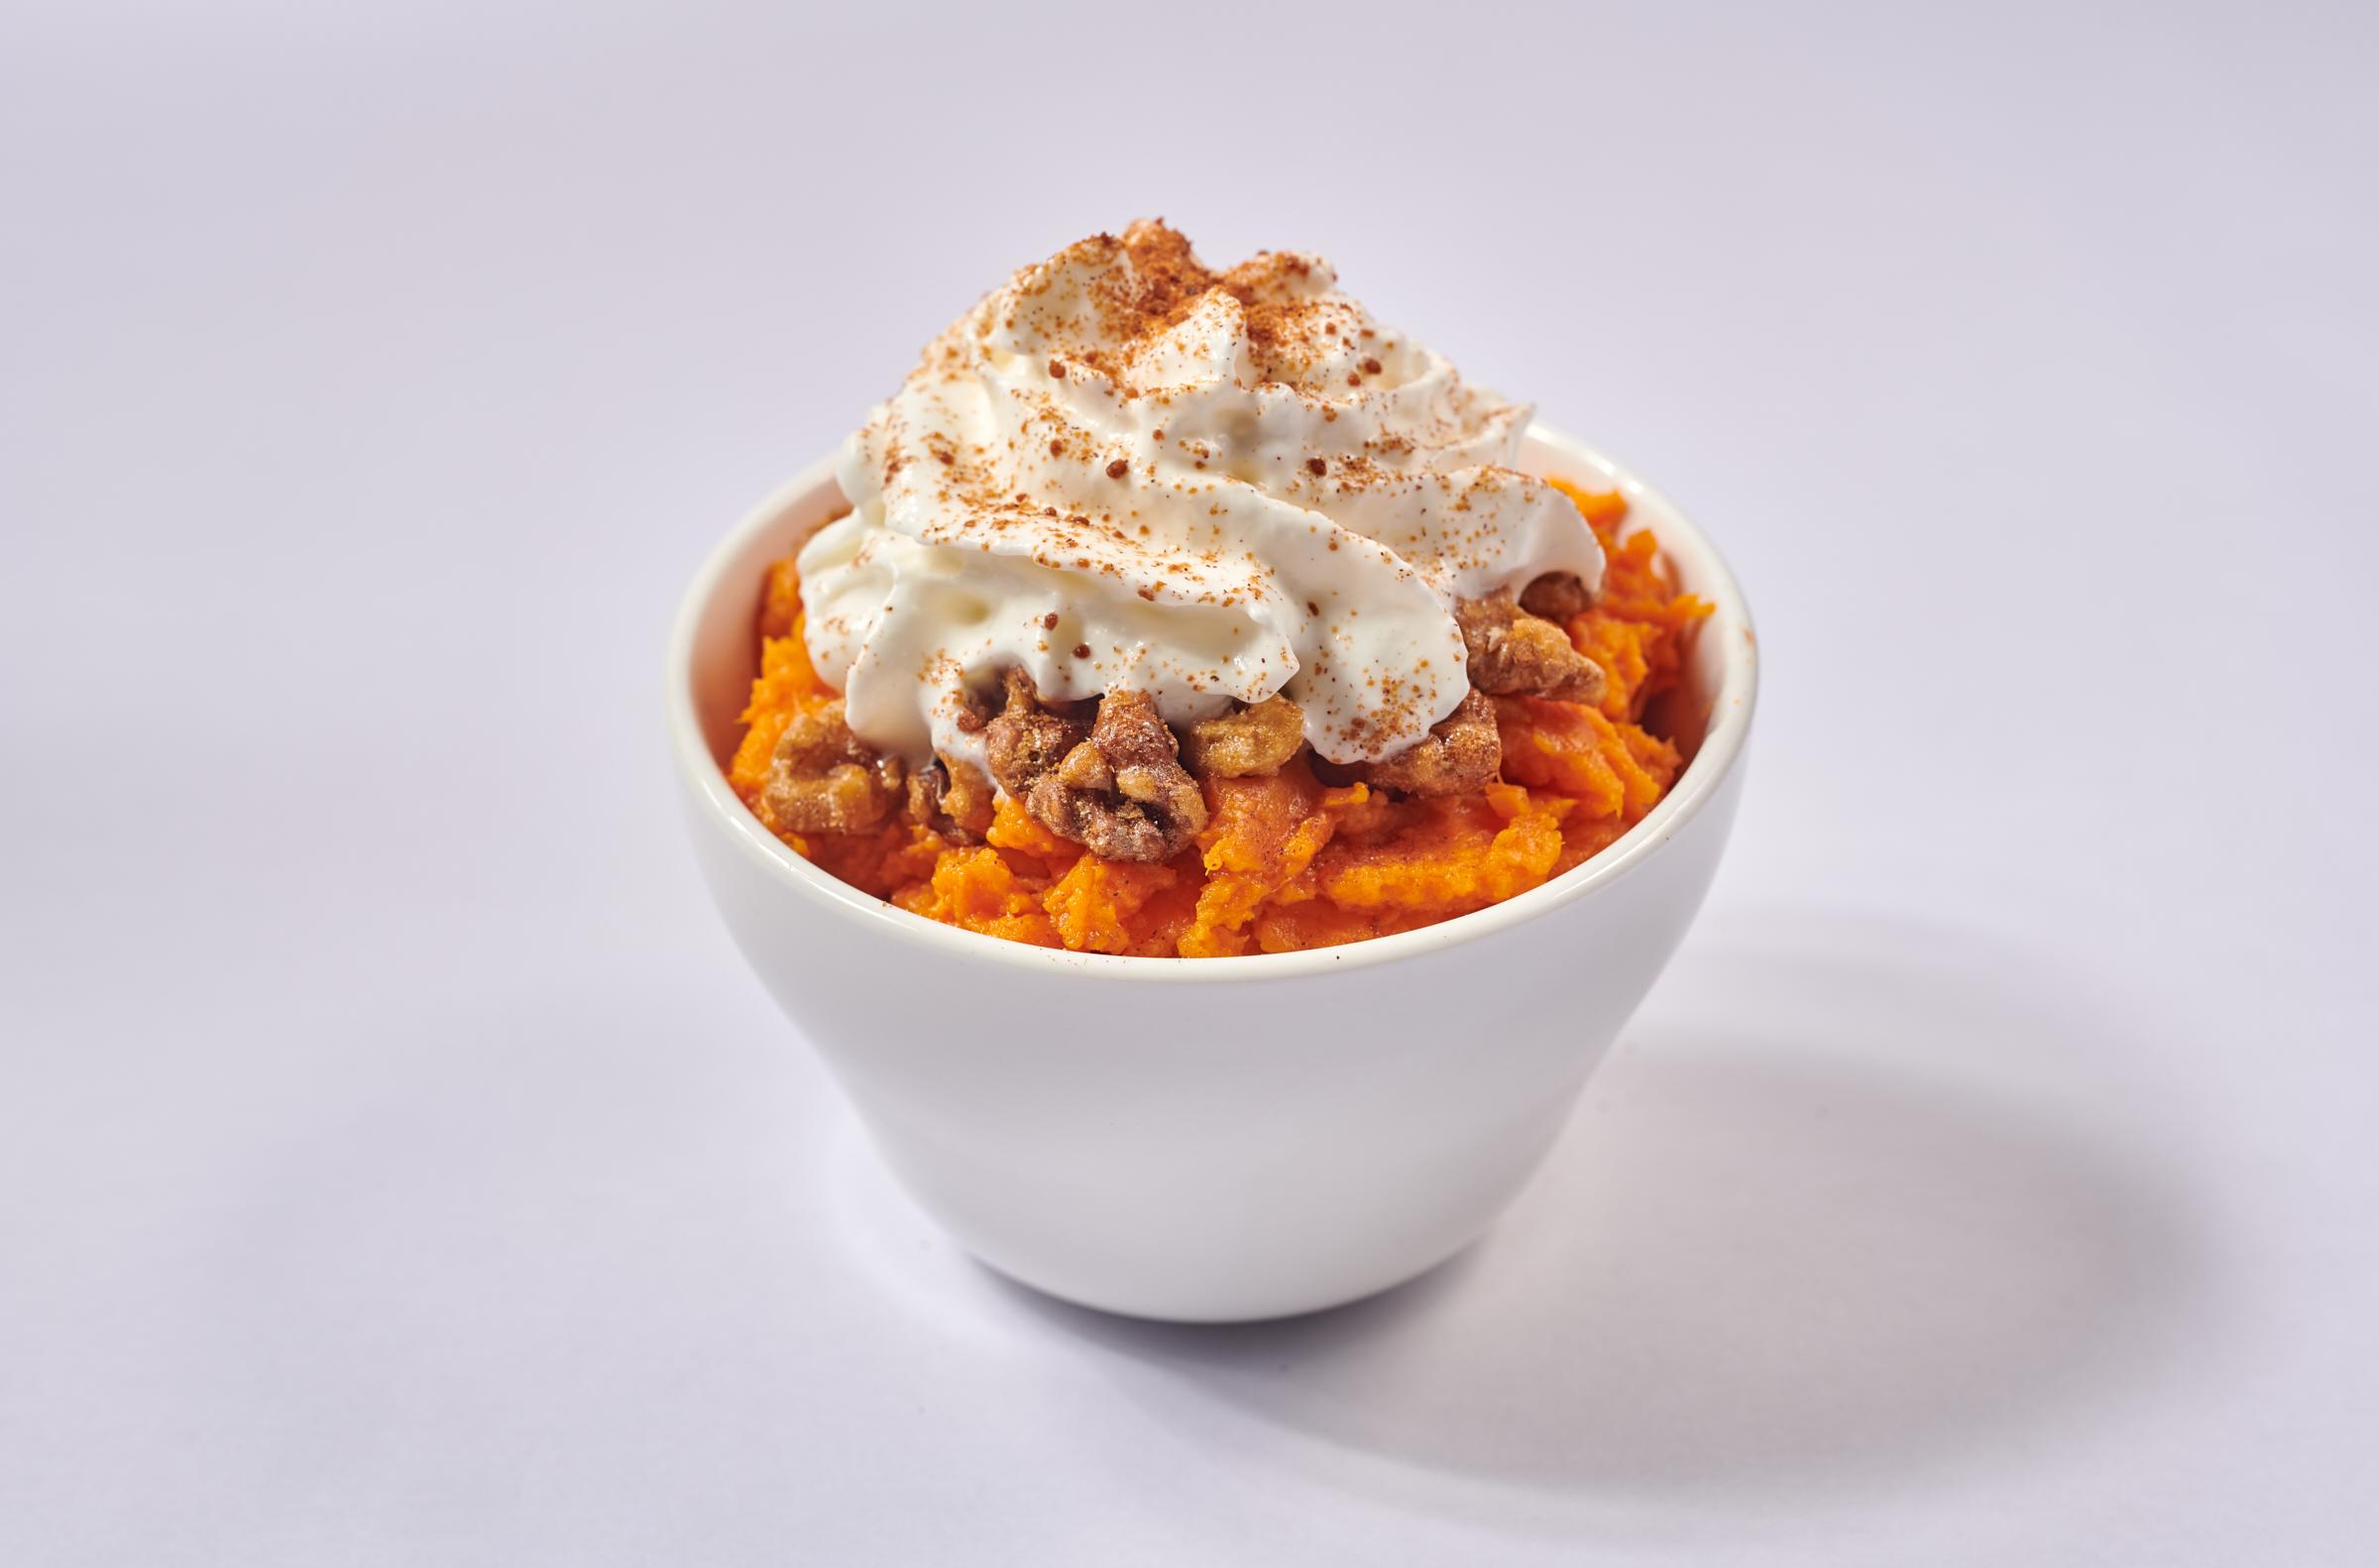 Sweet Sweet Potato - $4.95 - Sweet Potato, whipped cream, coconut sugar, candied walnut, cinnamon - GLUTEN-FREE